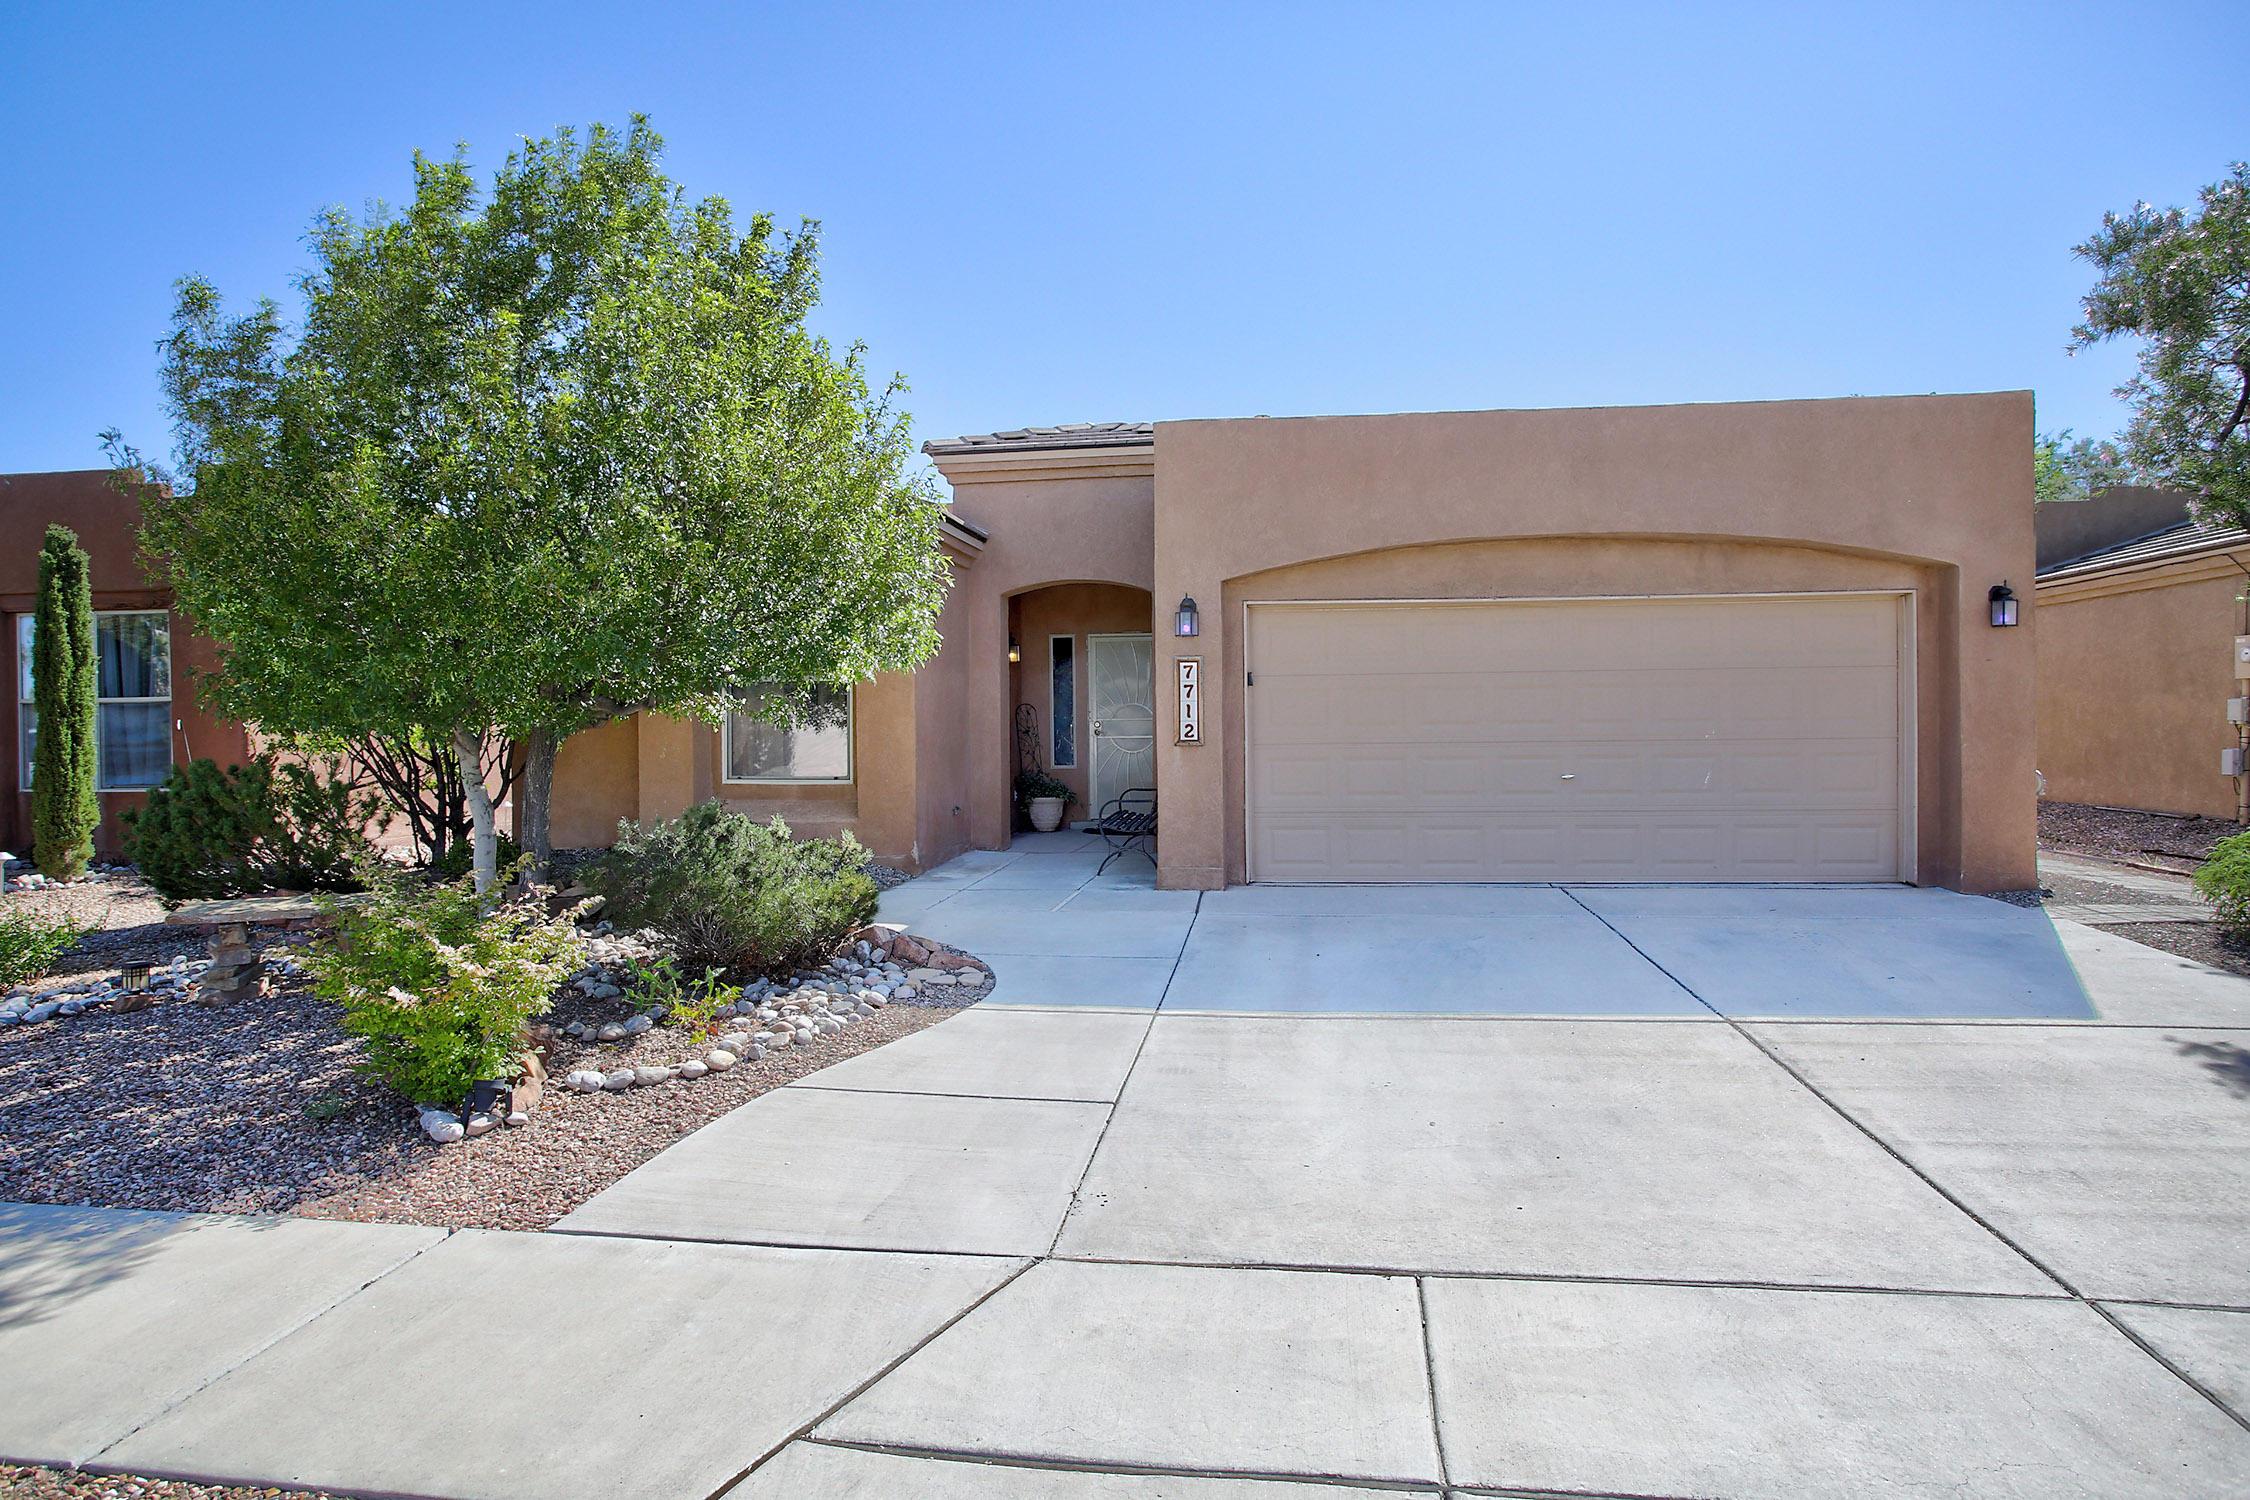 7712 Calle Carisma NE Property Photo - Albuquerque, NM real estate listing